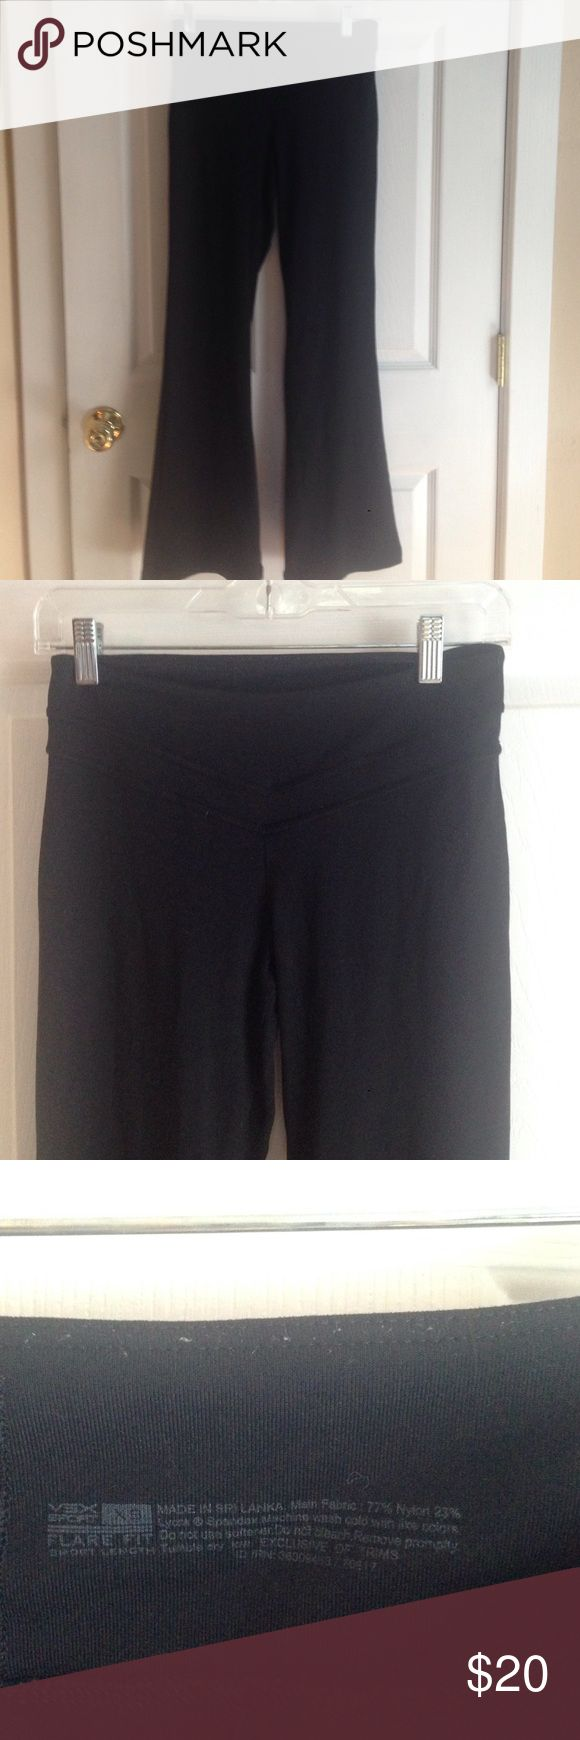 Victoria Secret Spandex Flare Fit Pants Flare fit, Victoria Secret Spandex pants.  Comfy for daily wear it gym wear. Victoria's Secret Pants